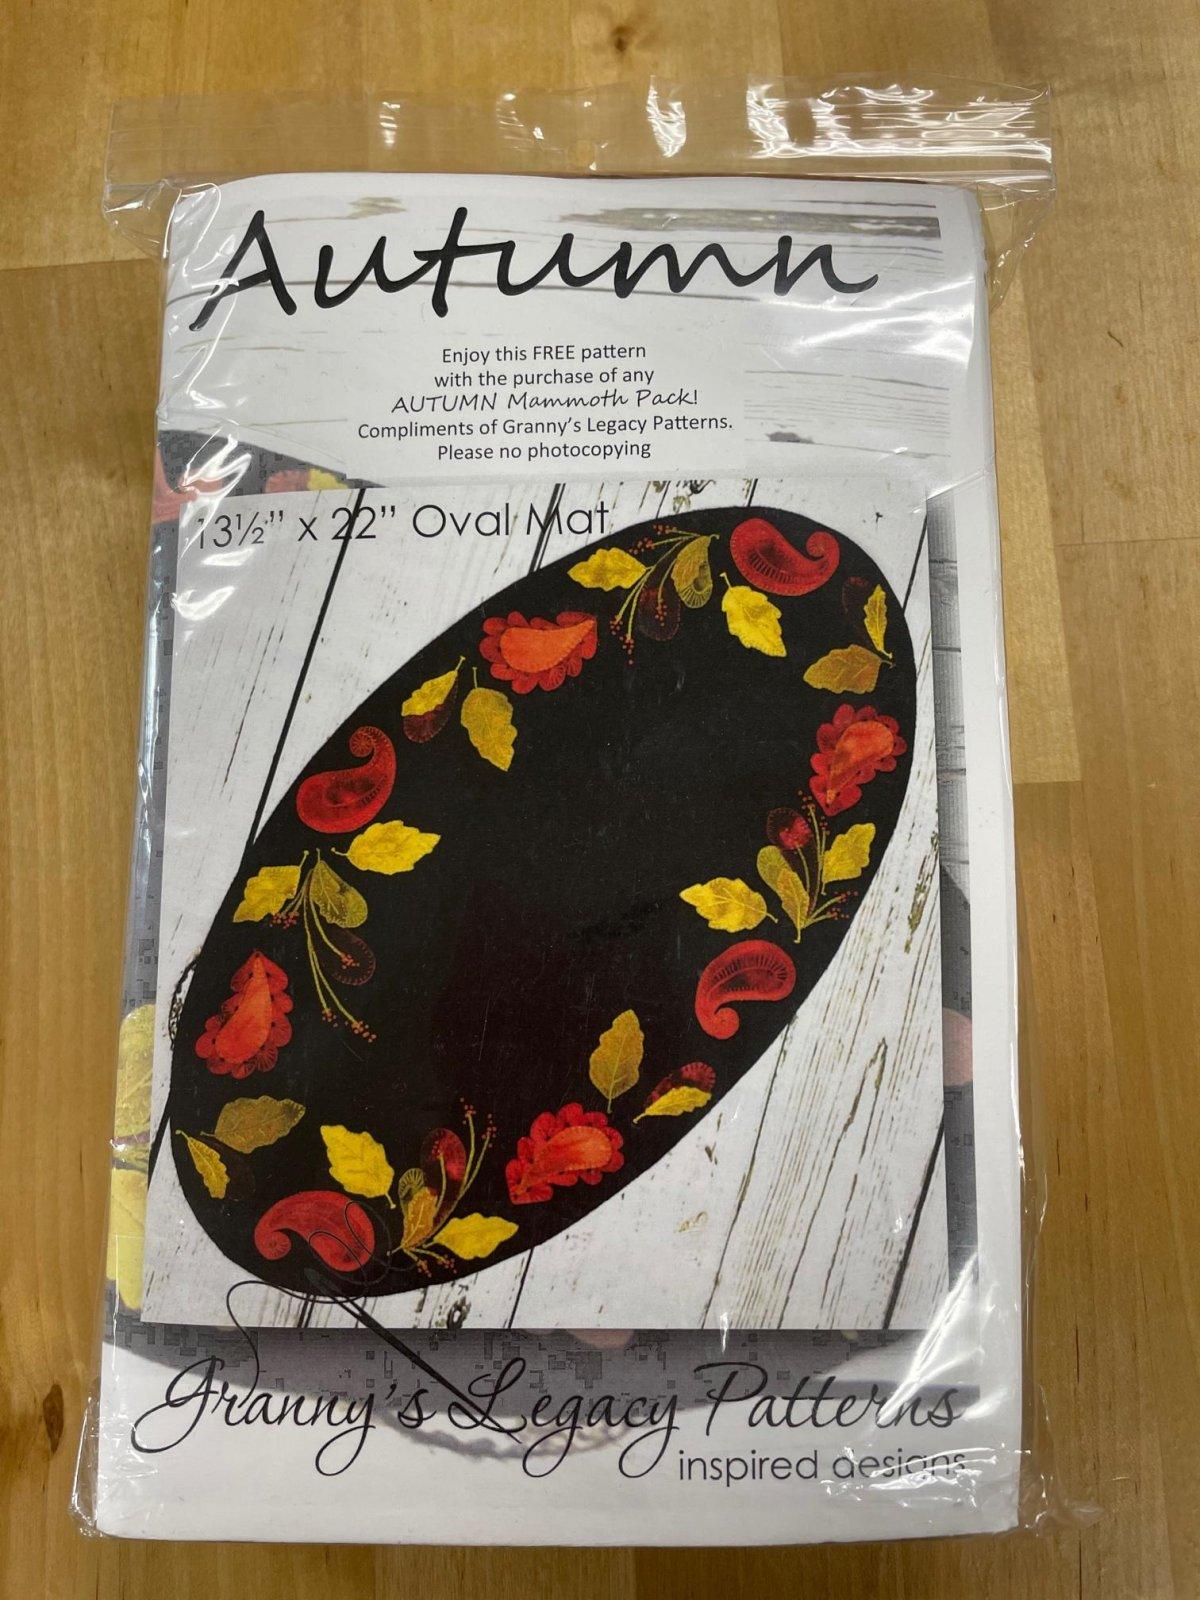 Autumn B Kit w Mammoth Pack